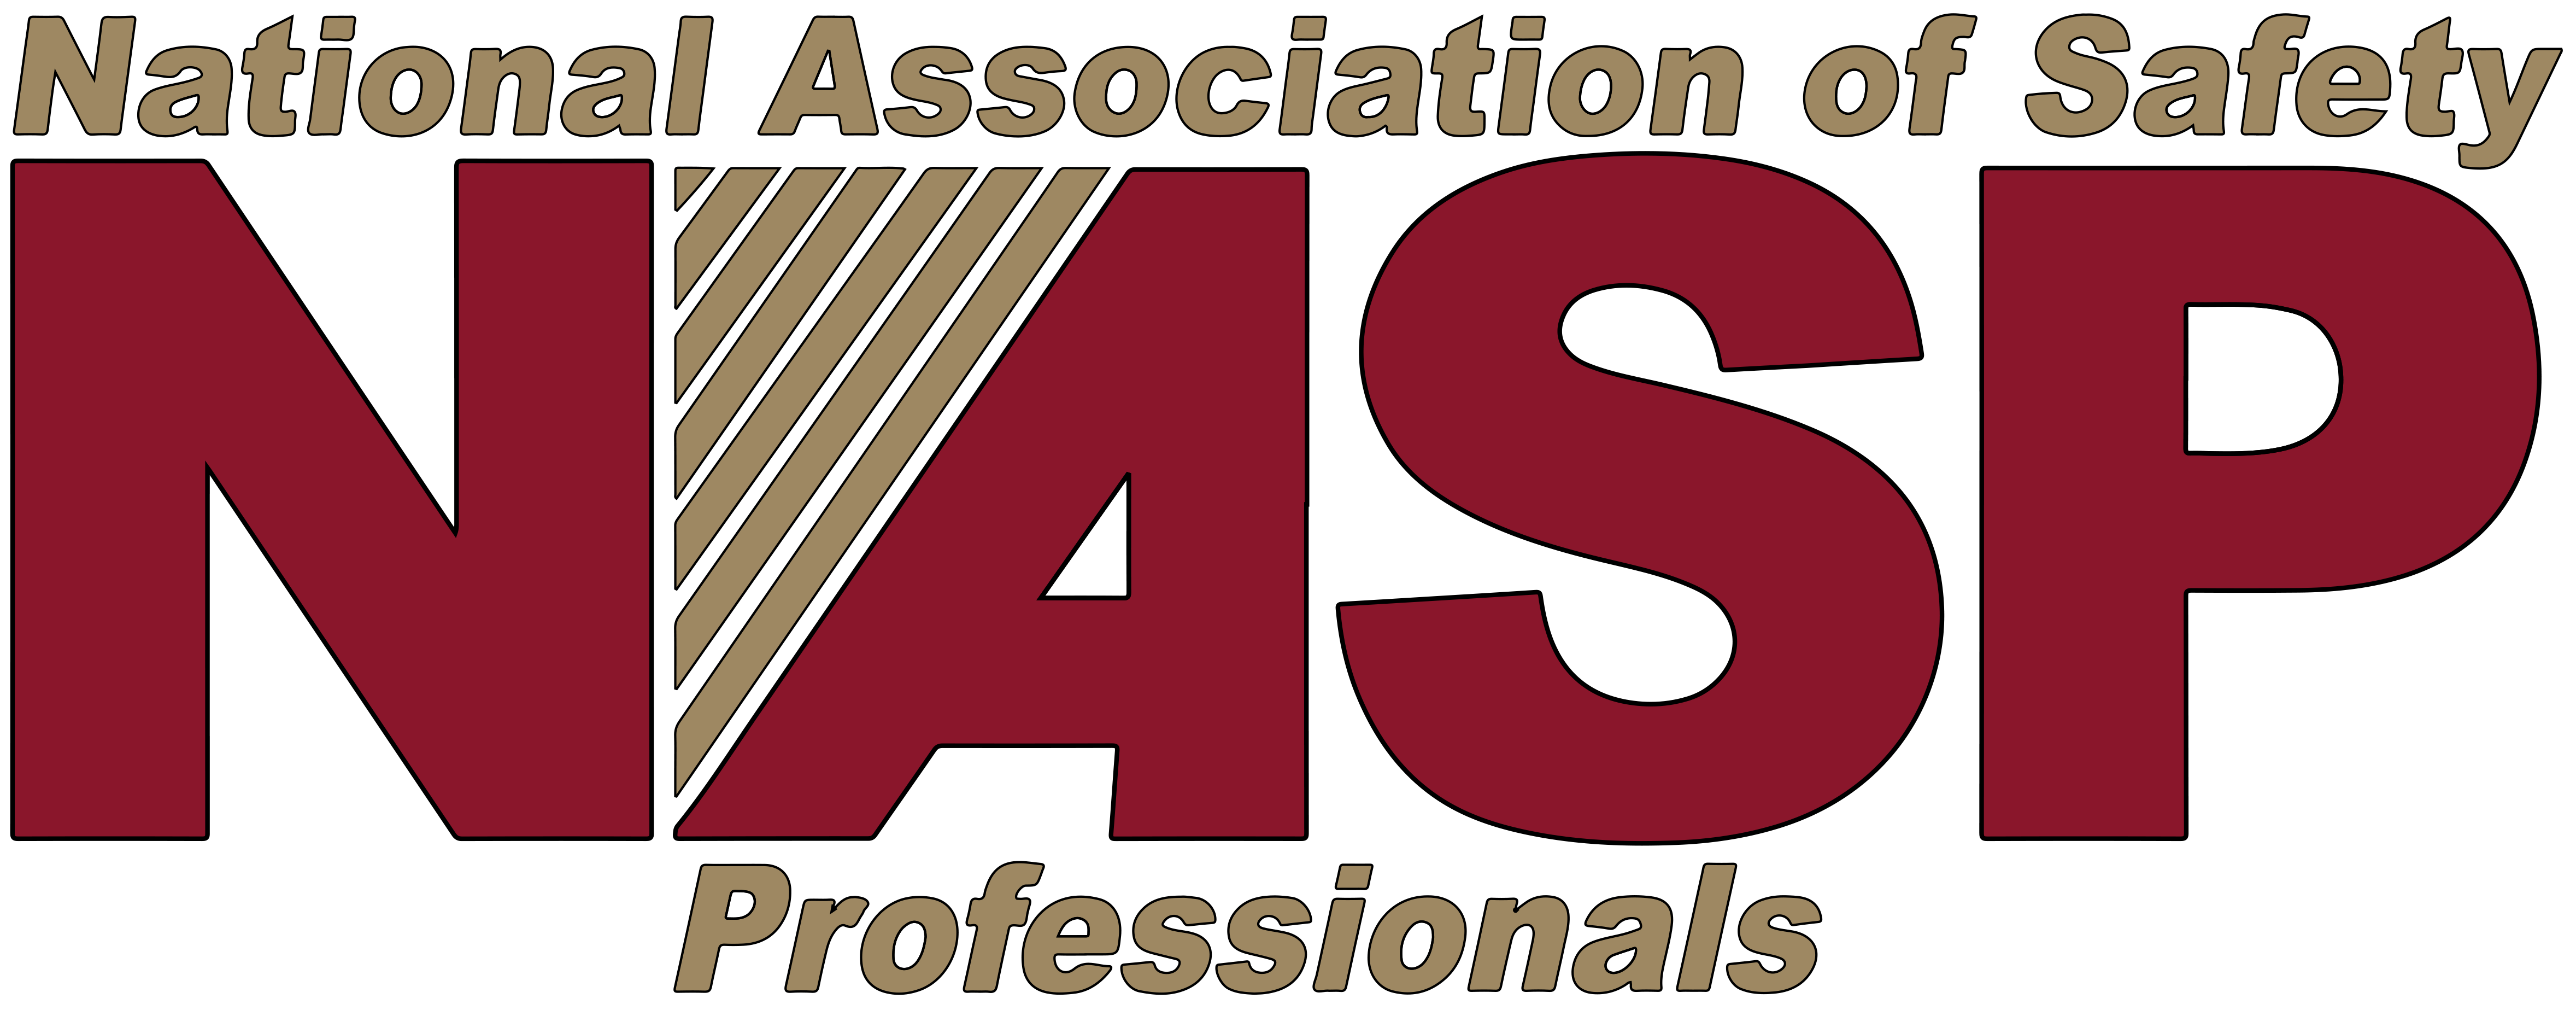 NASP Accreditation